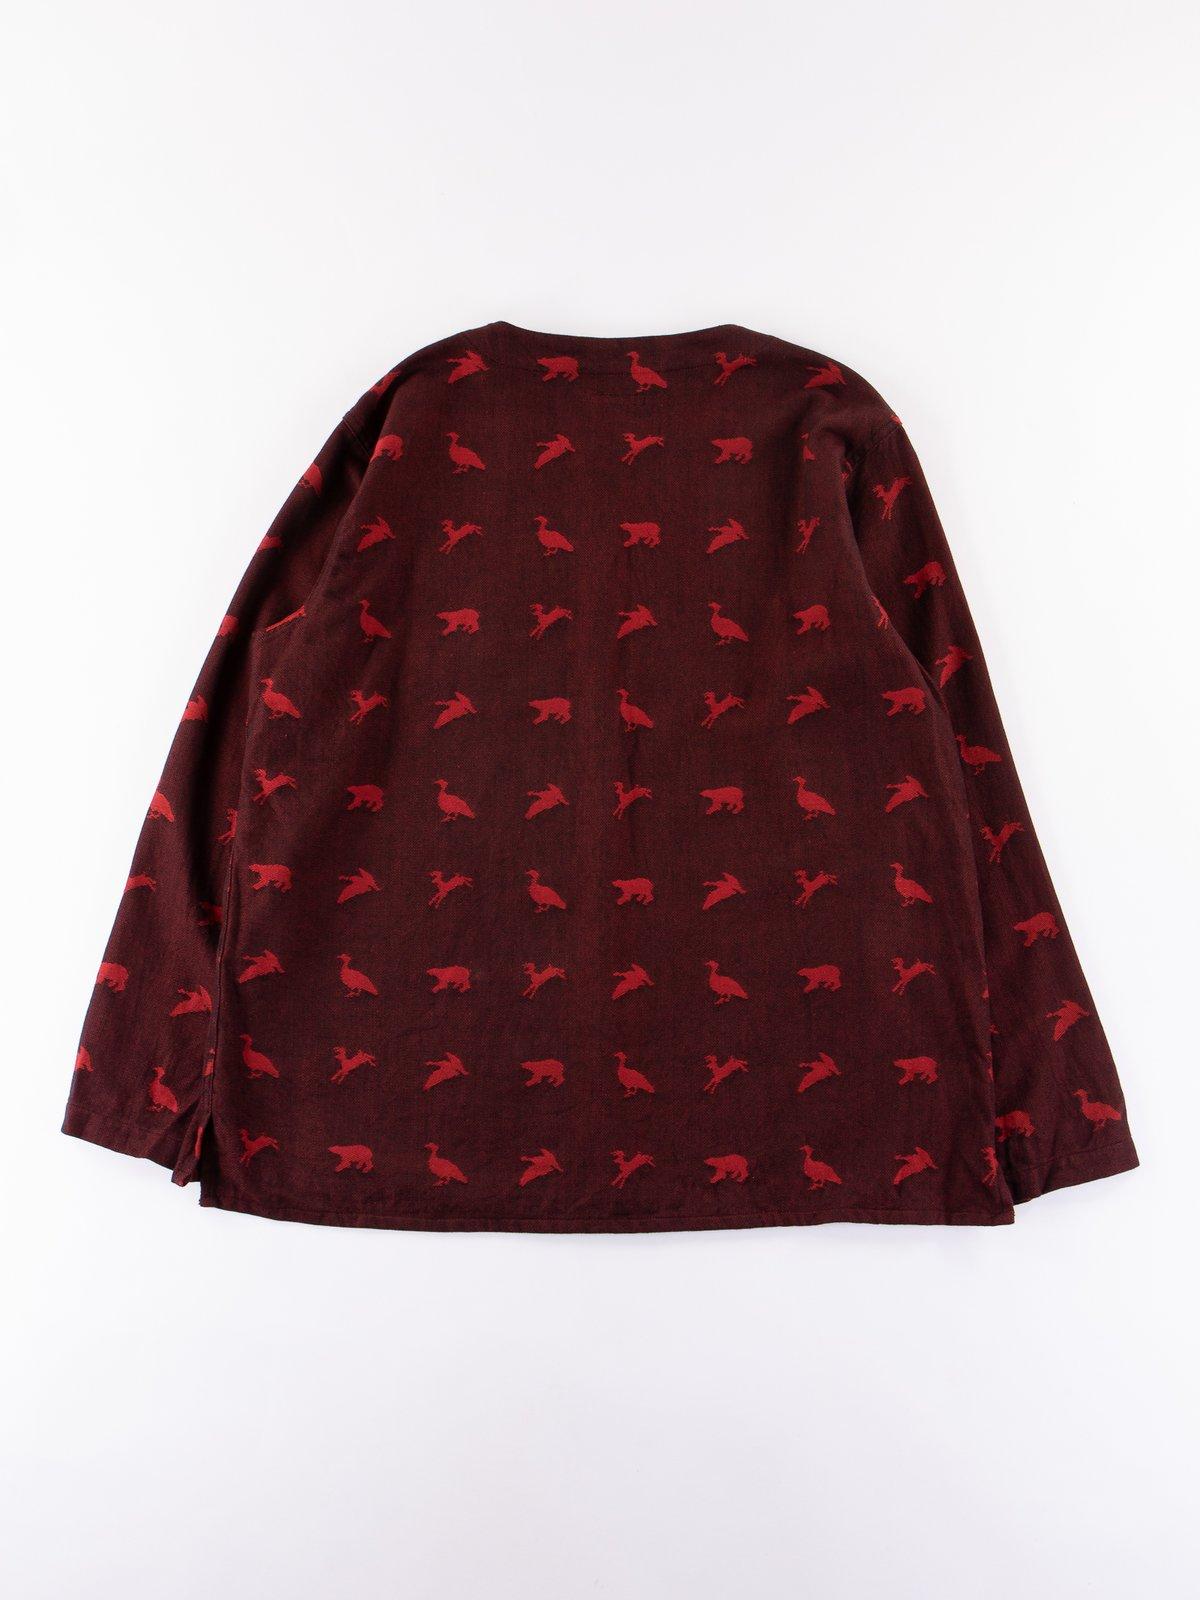 Black/Red Game Animal Jacquard MED Shirt - Image 5